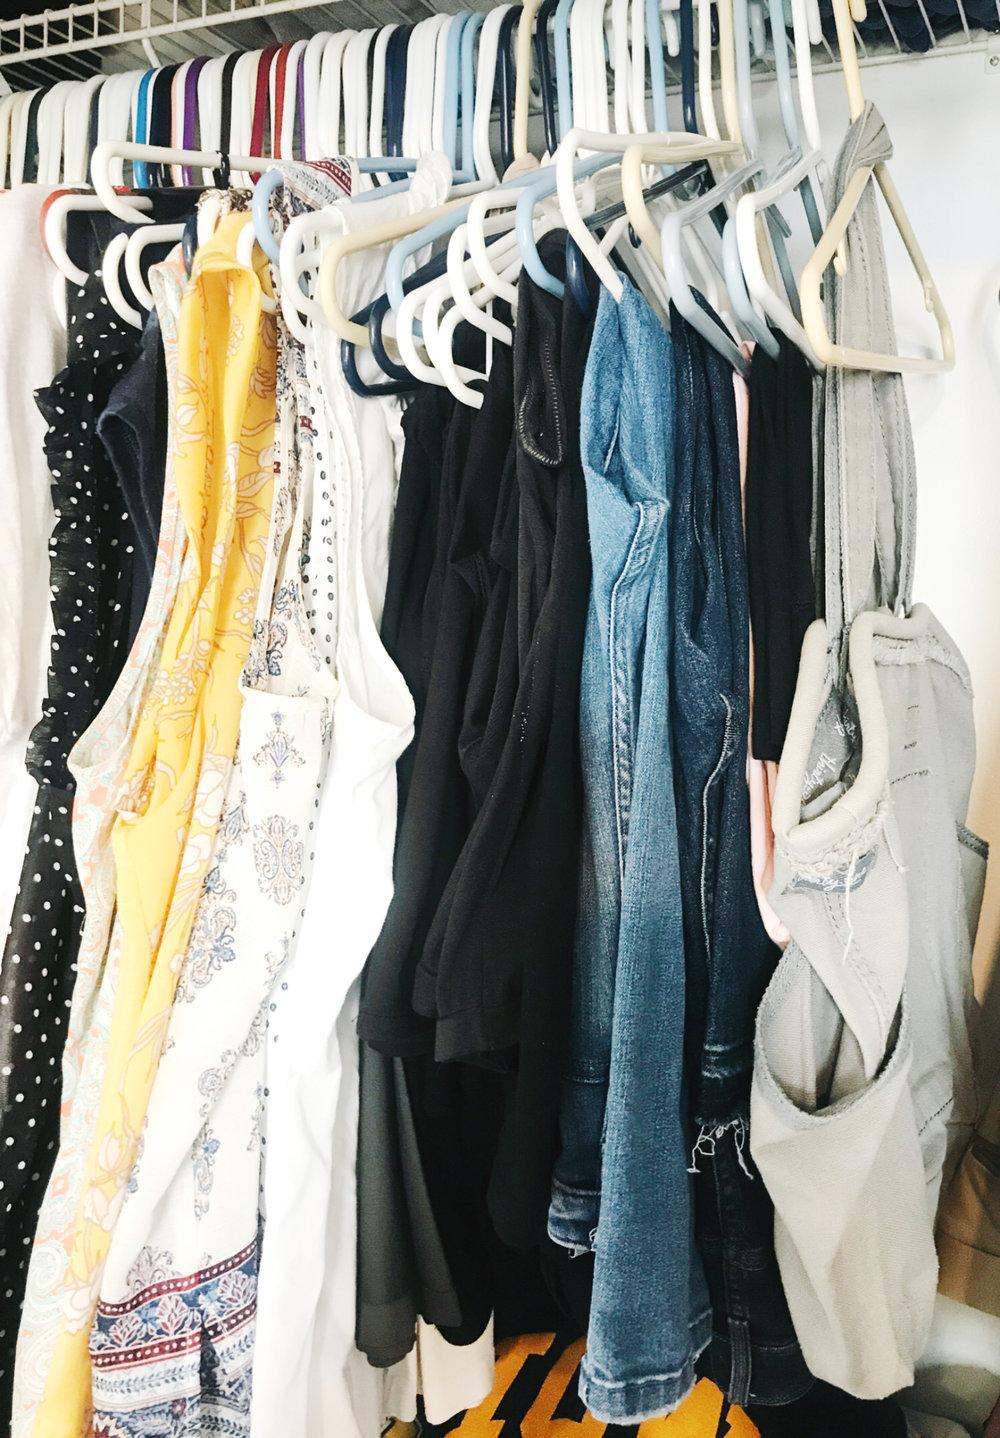 Organizing Your Closet from hprallandco.com